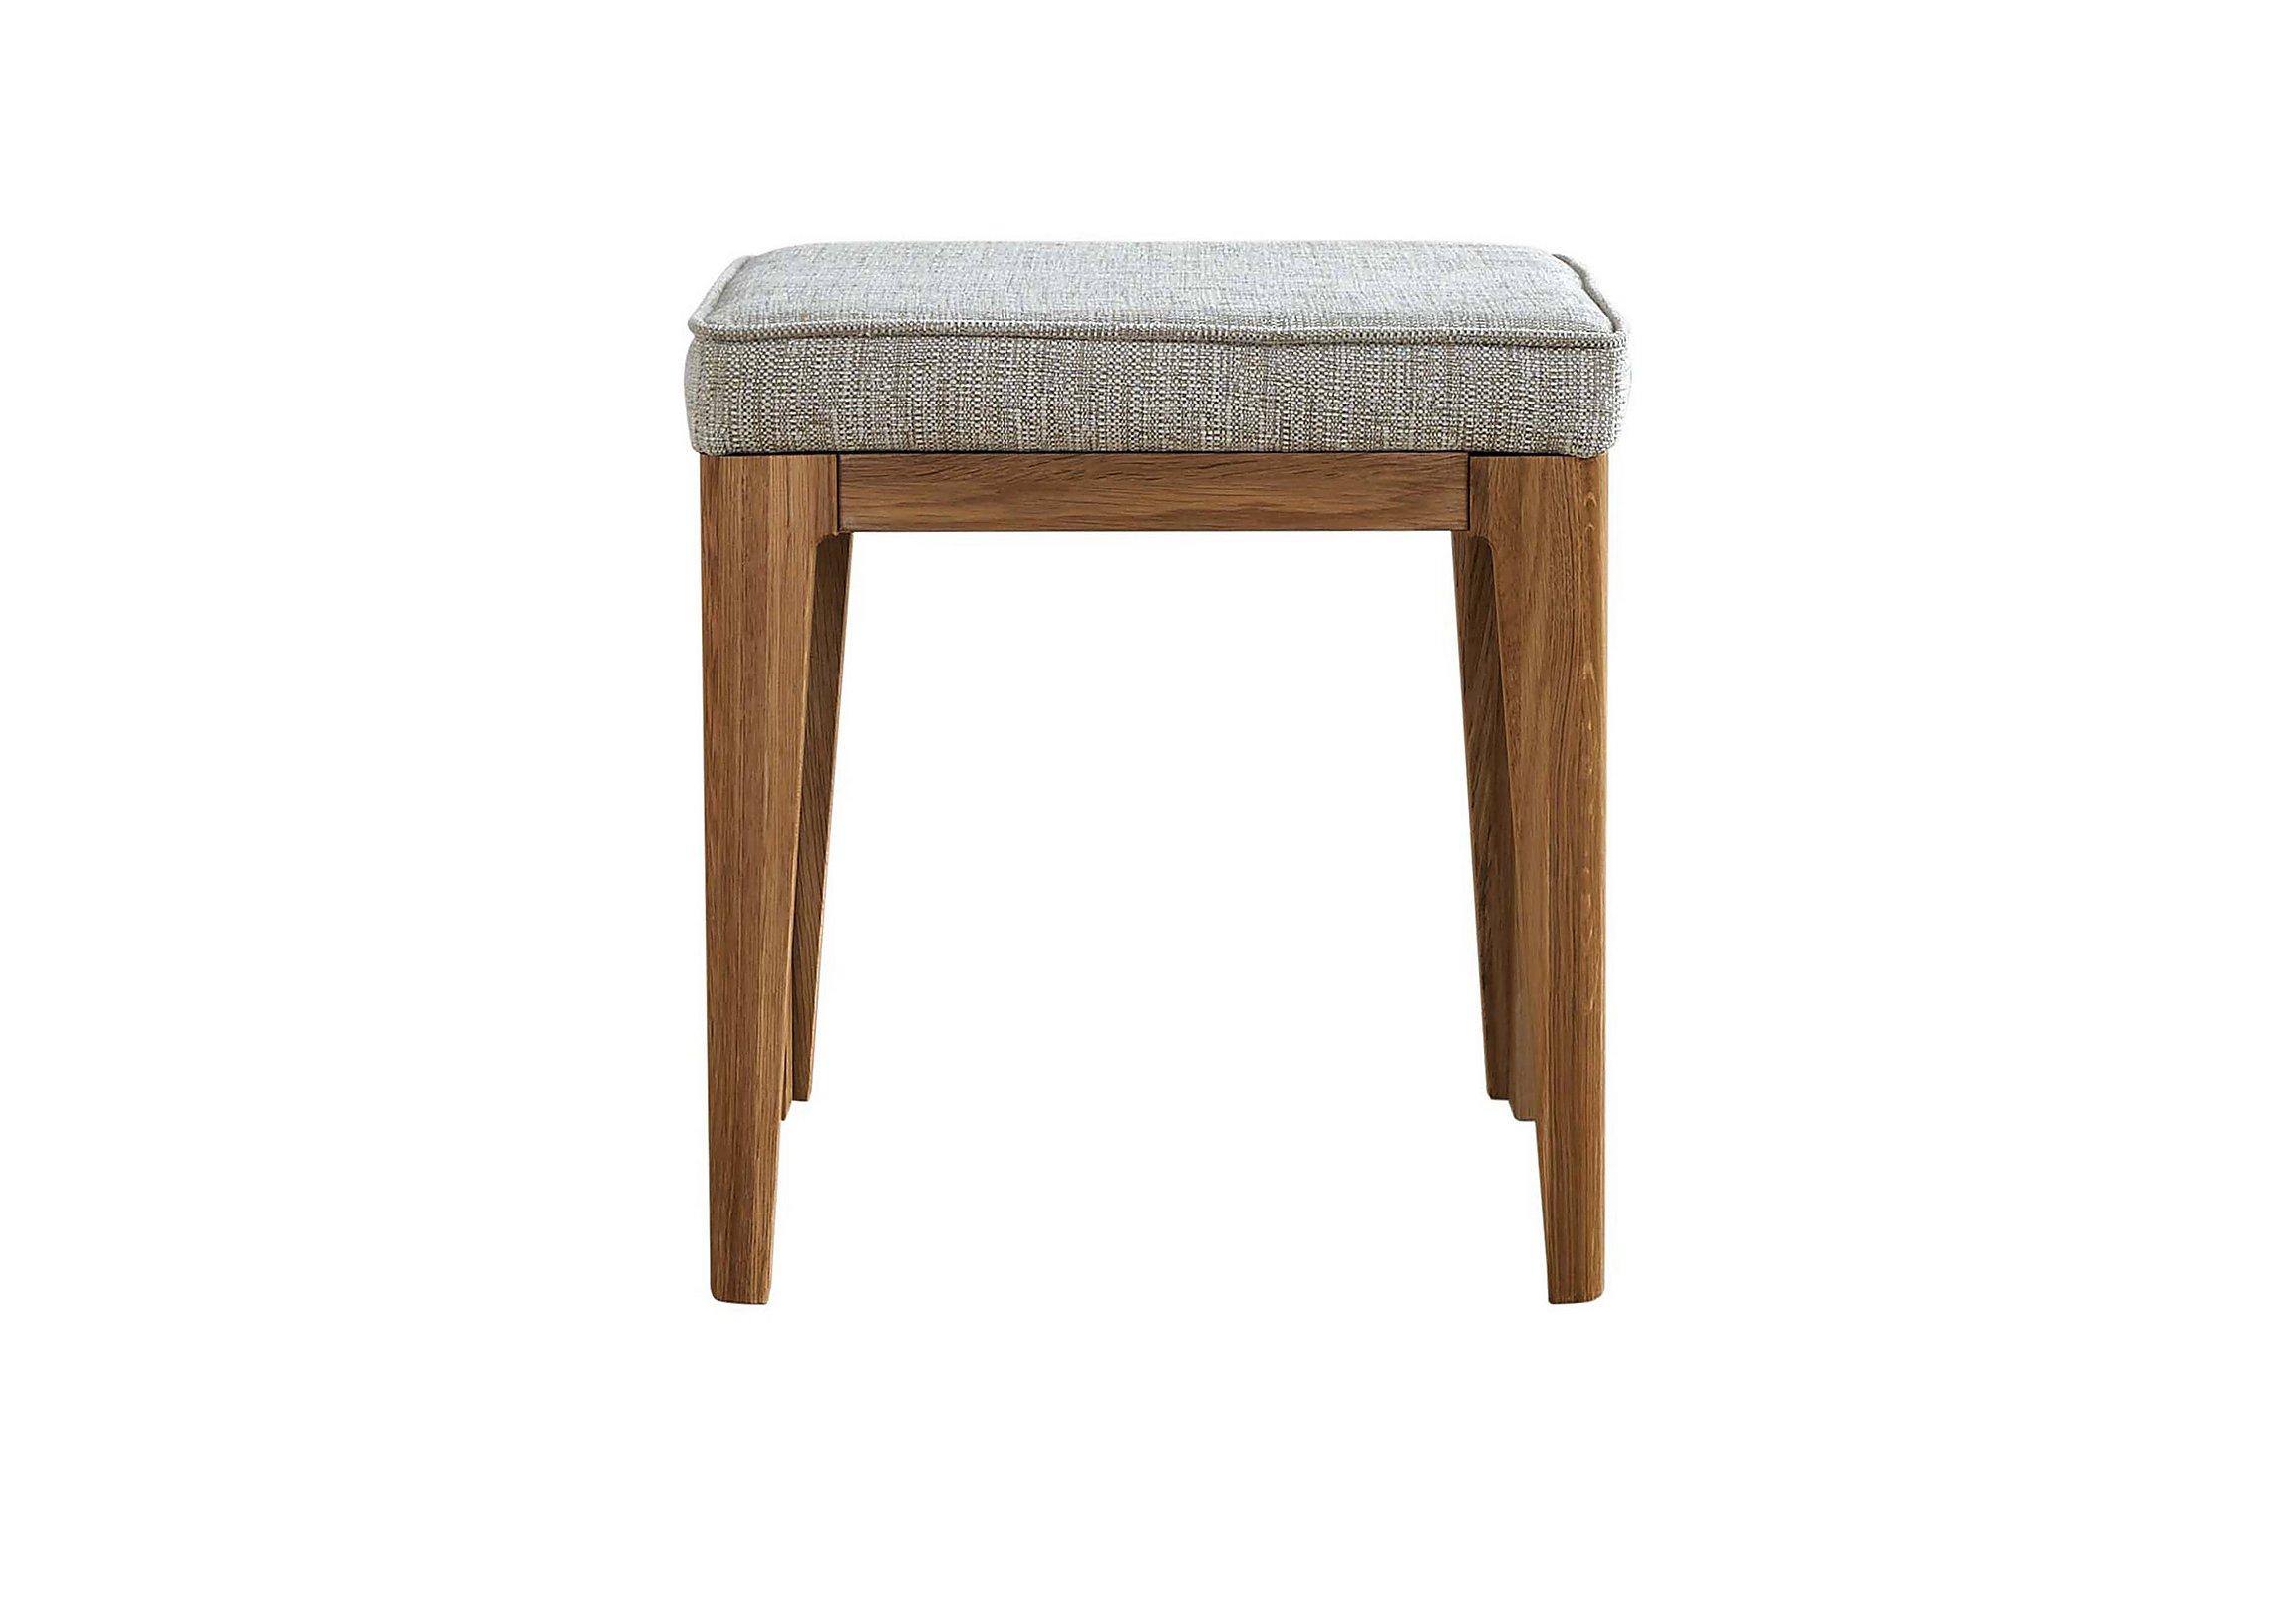 Pine Bedroom Stool Dressing Tables Small Vanity Stools Furniture Village